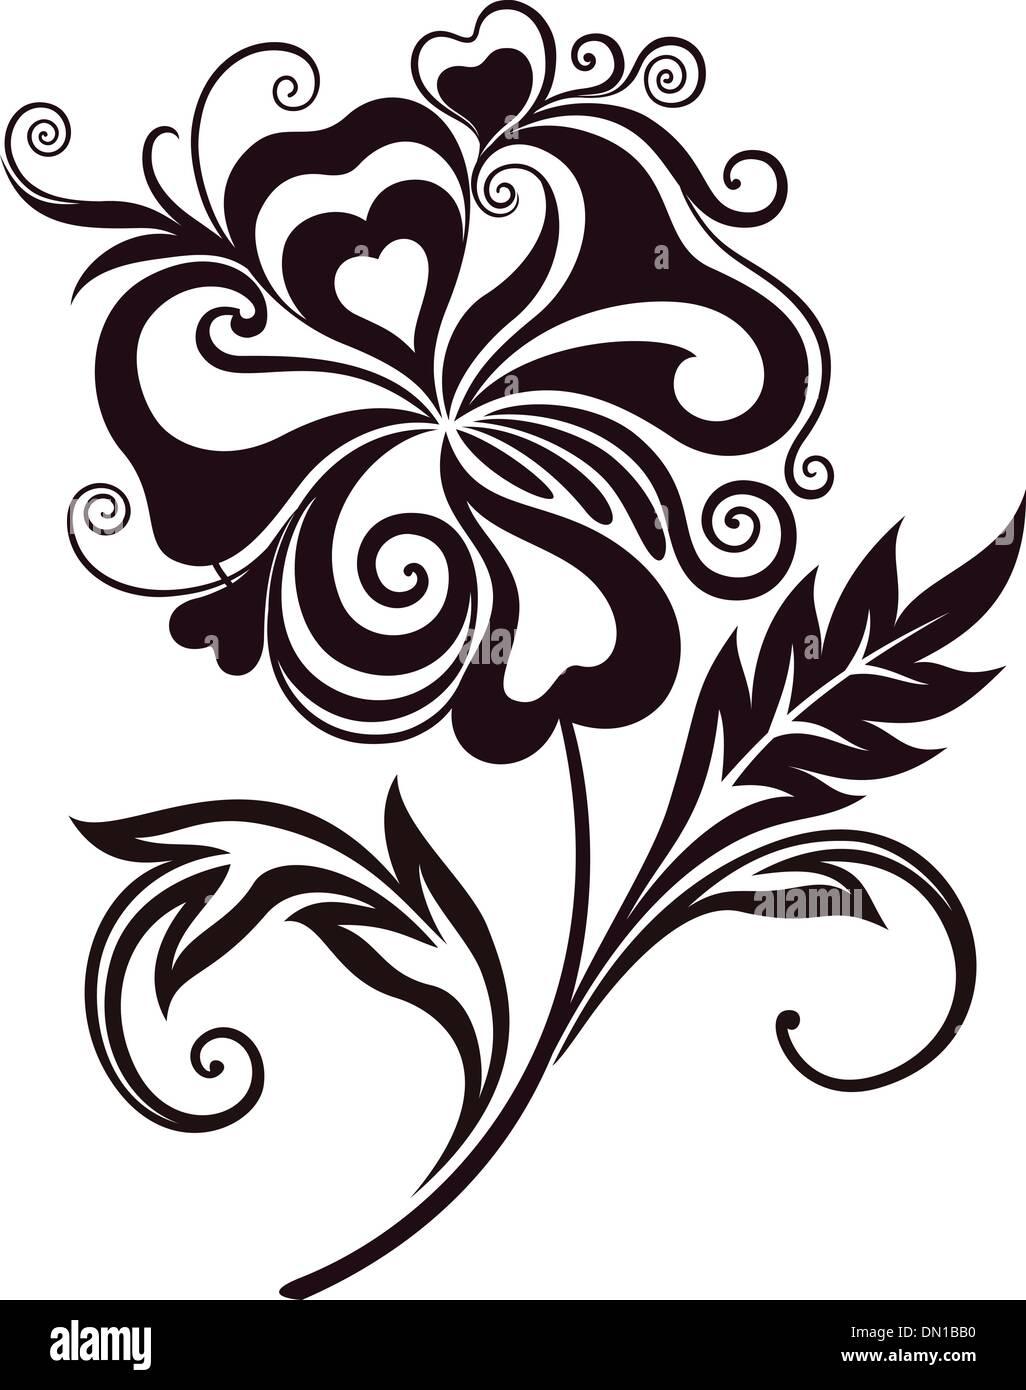 Abstract Flower Line Art Stock Vector Art Illustration